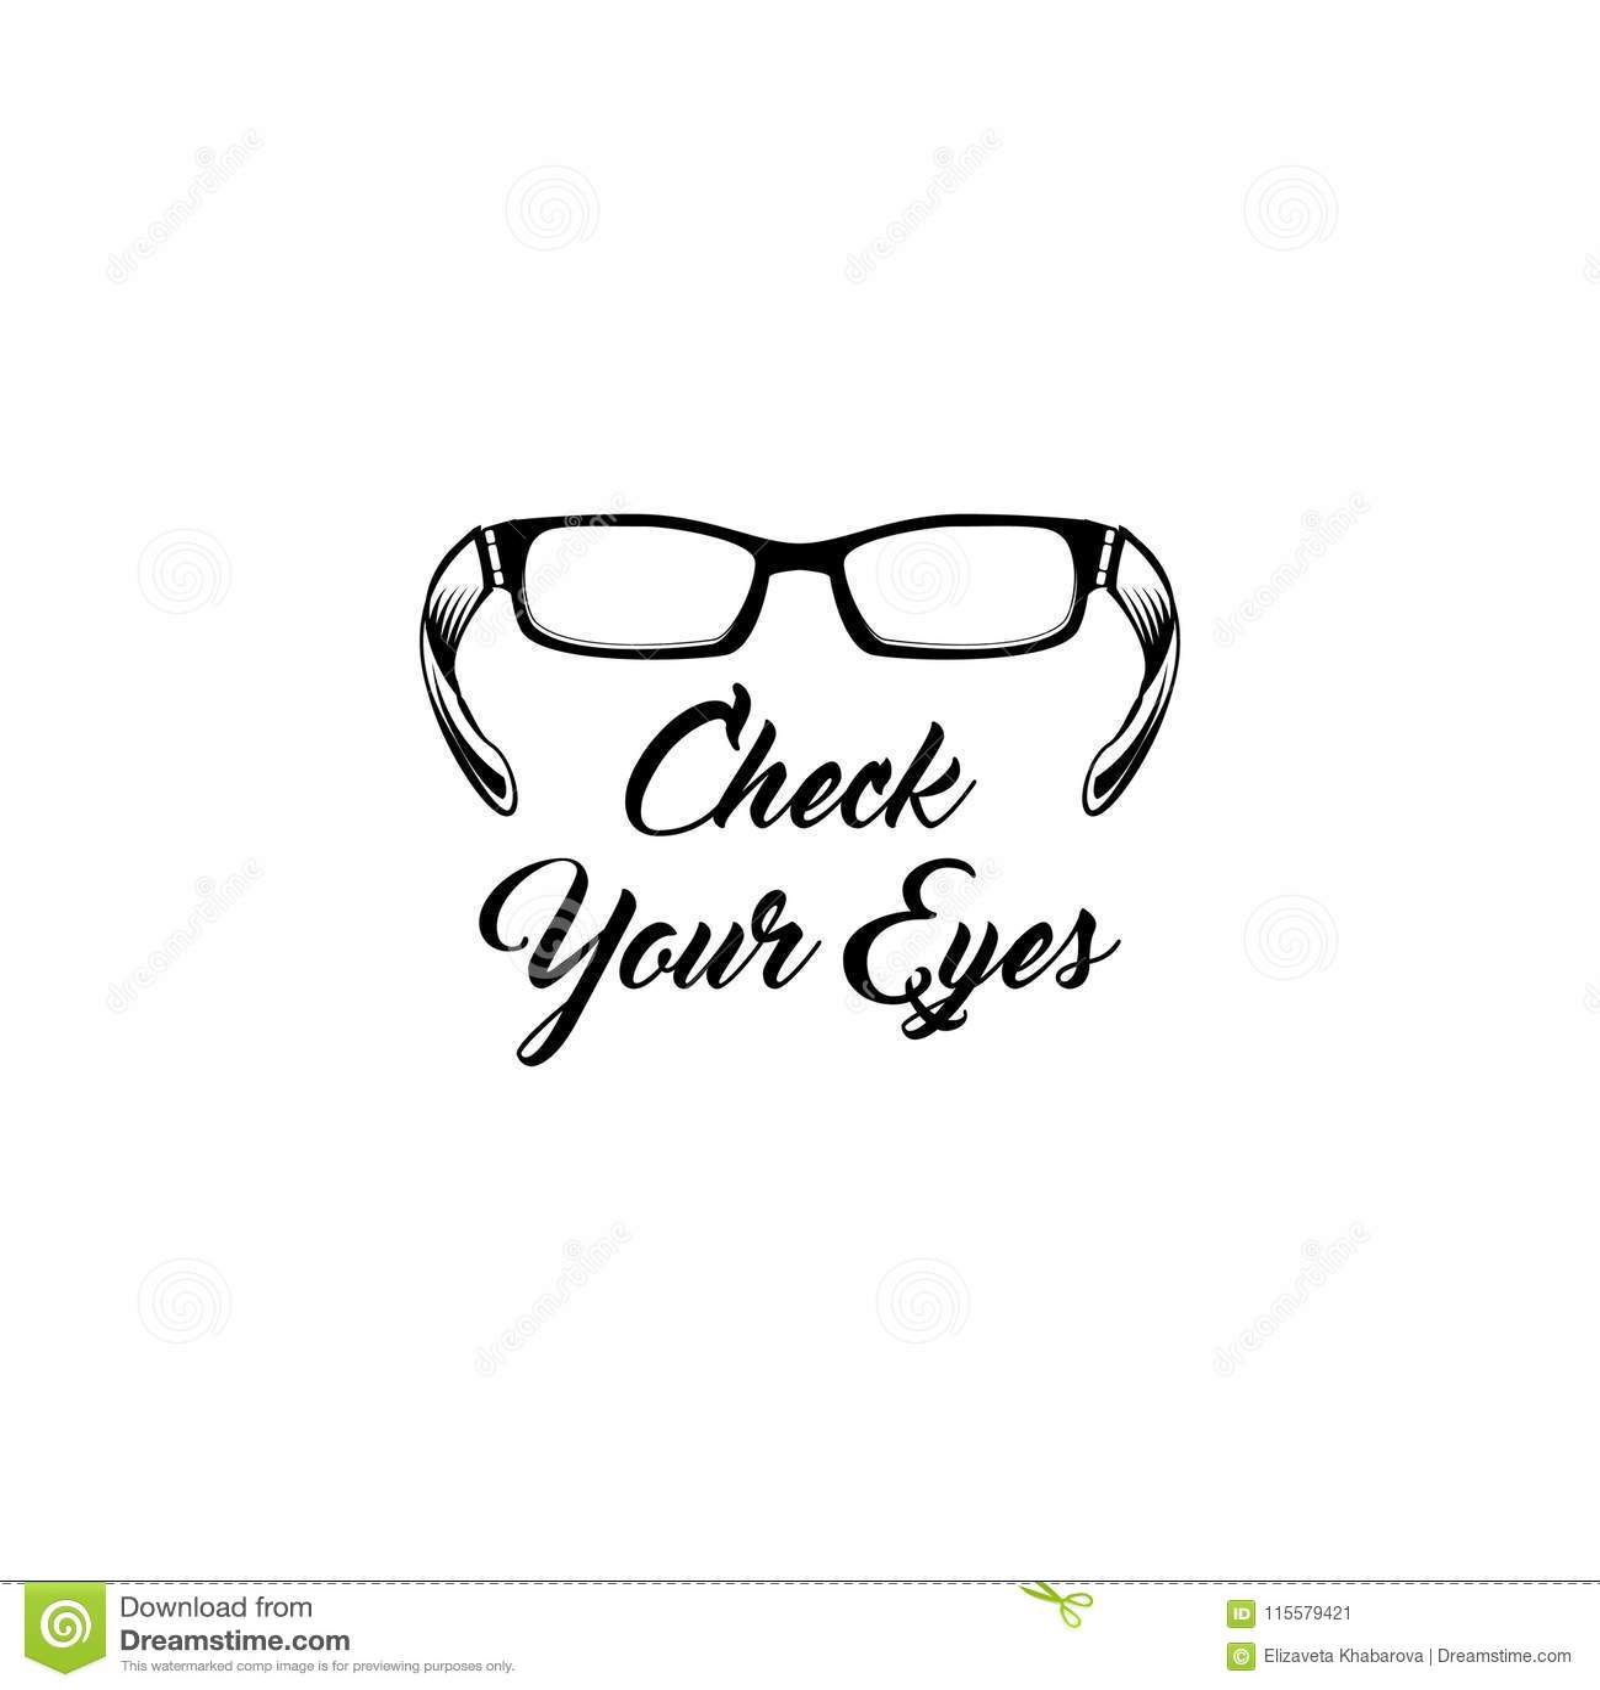 Glasses Icon Oculist Badge Check Your Eyes Inscription Eyeglasses